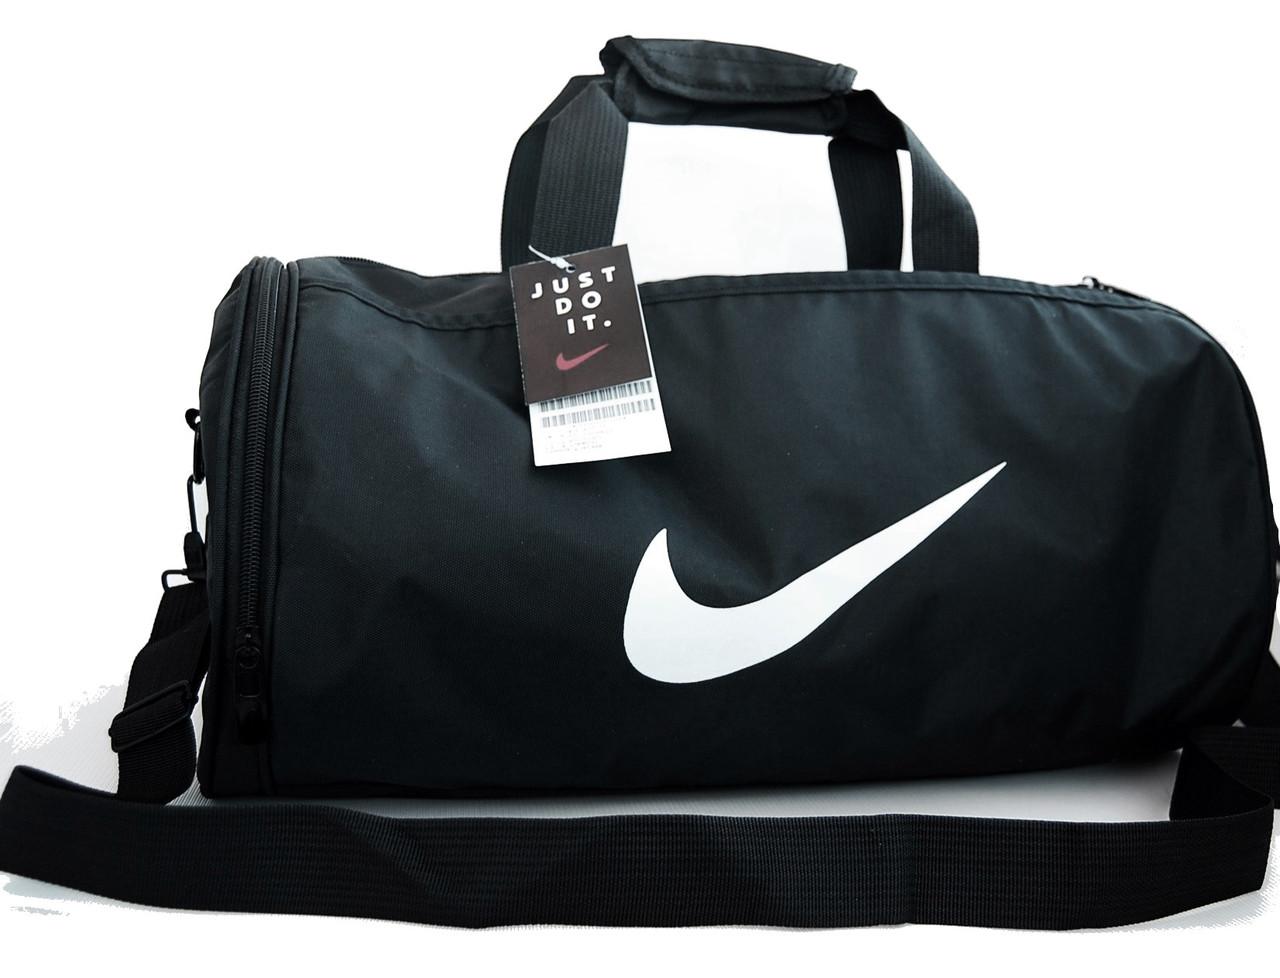 Nike дорожные сумки чемоданы in extenso